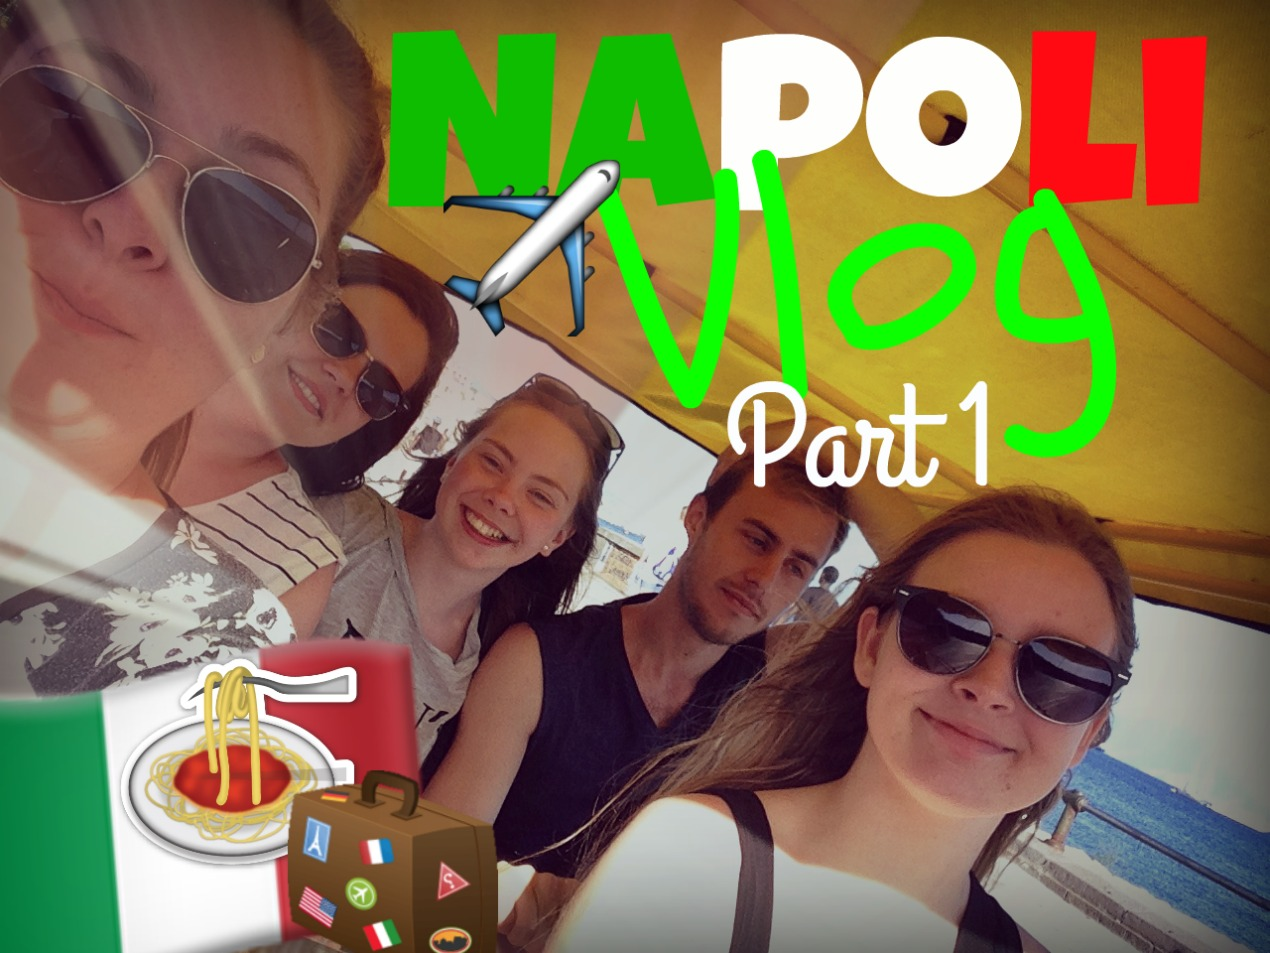 Napoli part 1